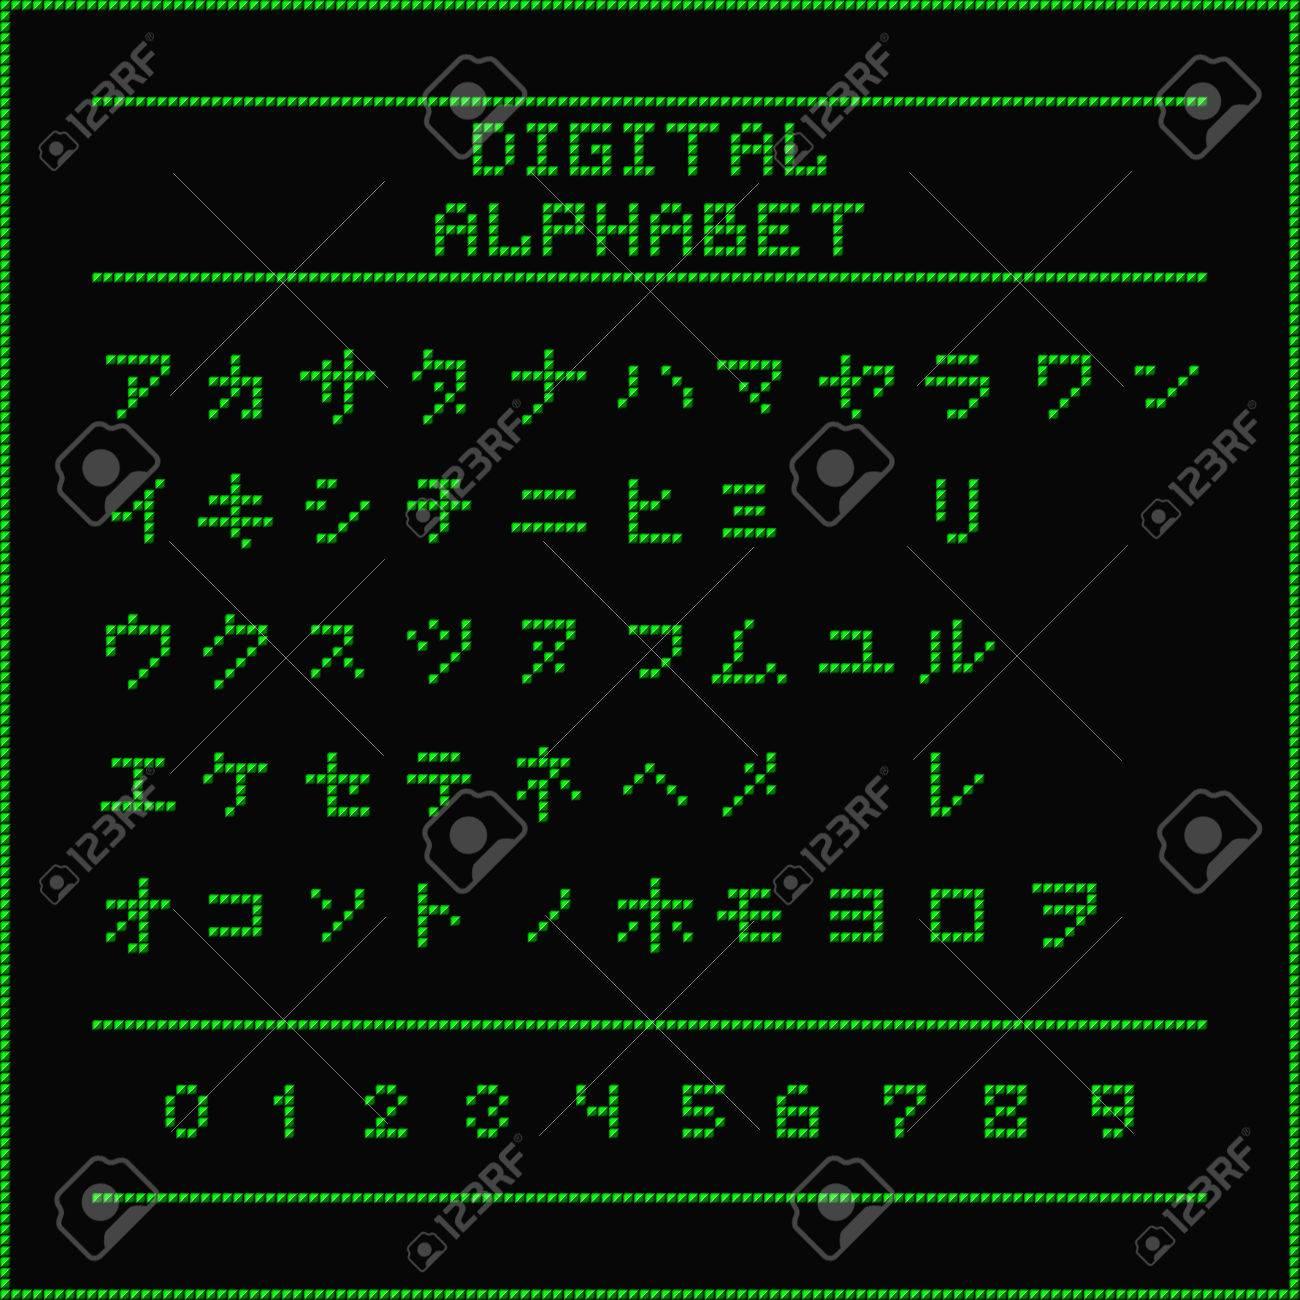 Digital alphabet  Font of the green dots - katakana letters